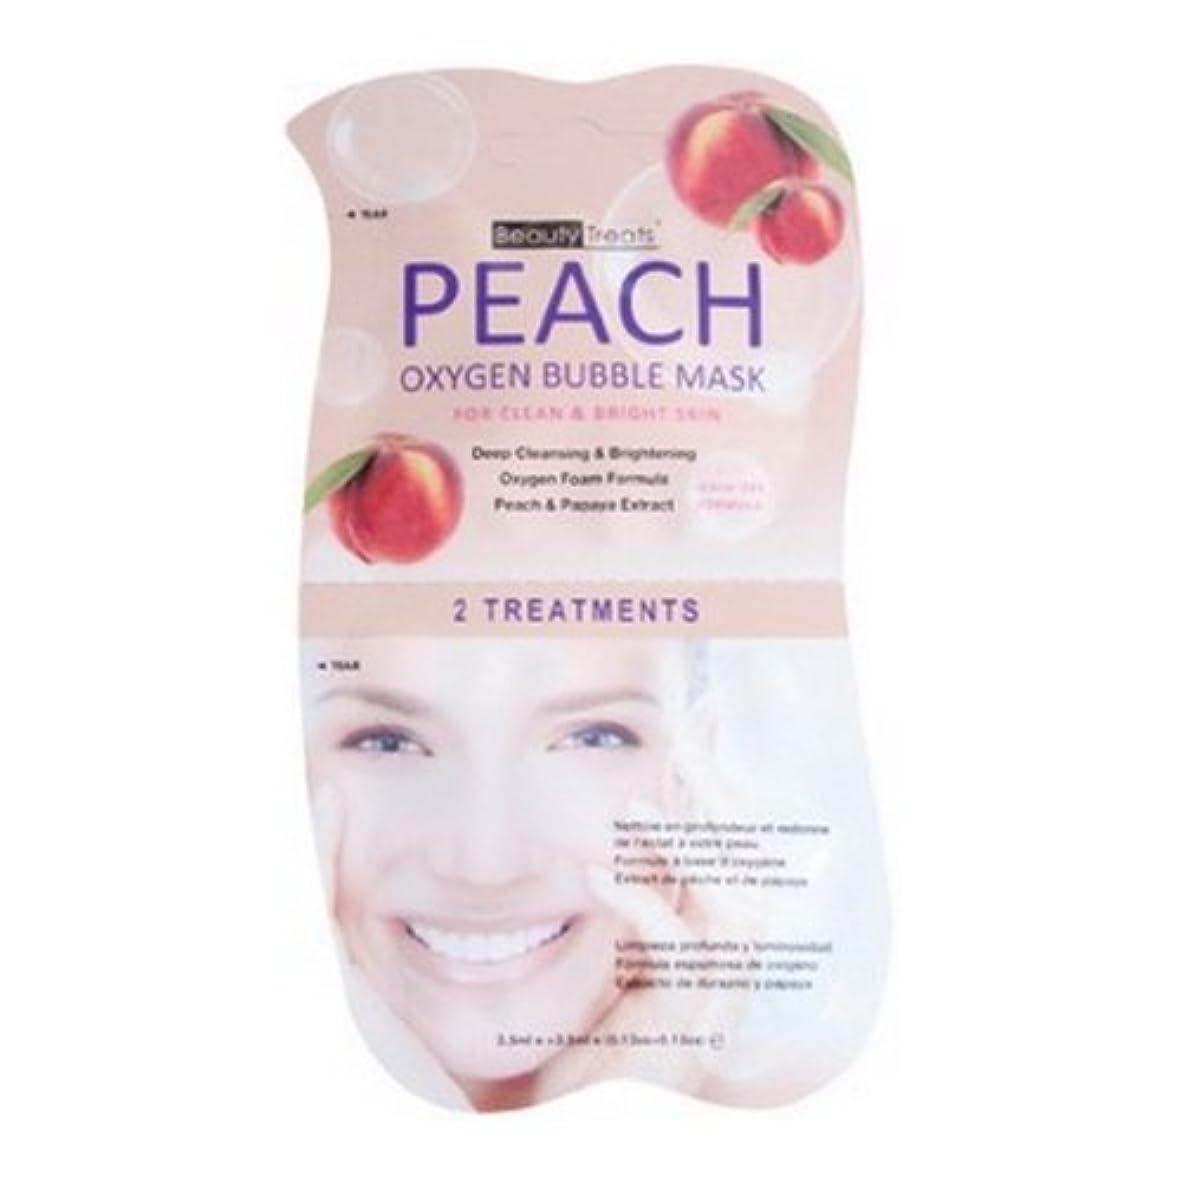 意図書士ピン(6 Pack) BEAUTY TREATS Peach Oxygen Bubble Mask - Peach (並行輸入品)